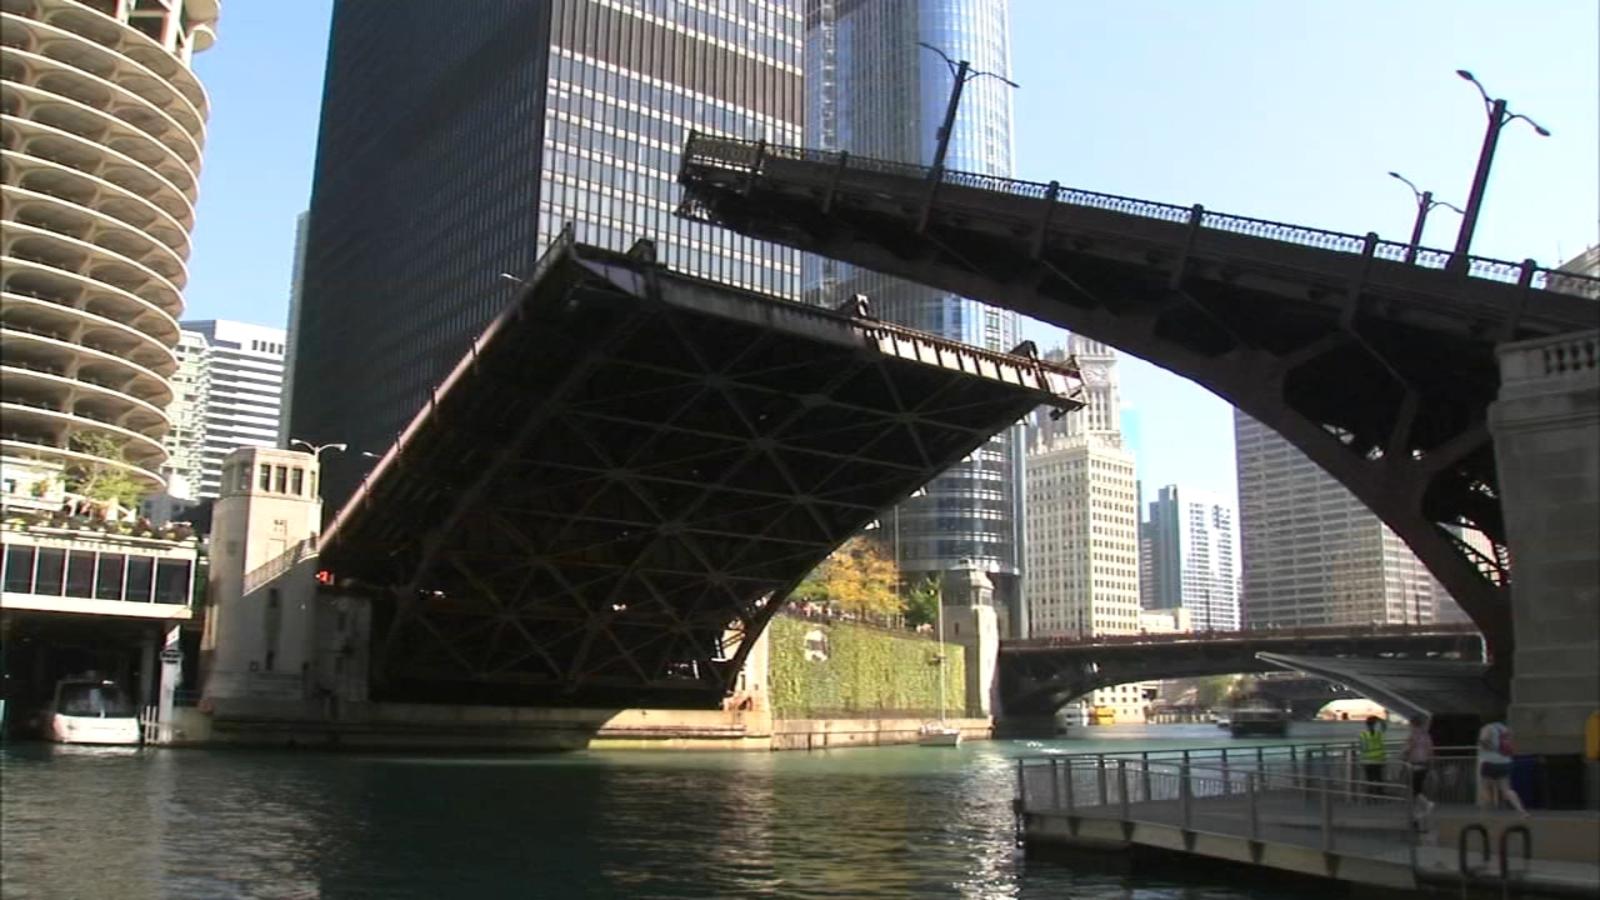 Bridge lifts along Chicago River begin Saturday, temporary traffic delays